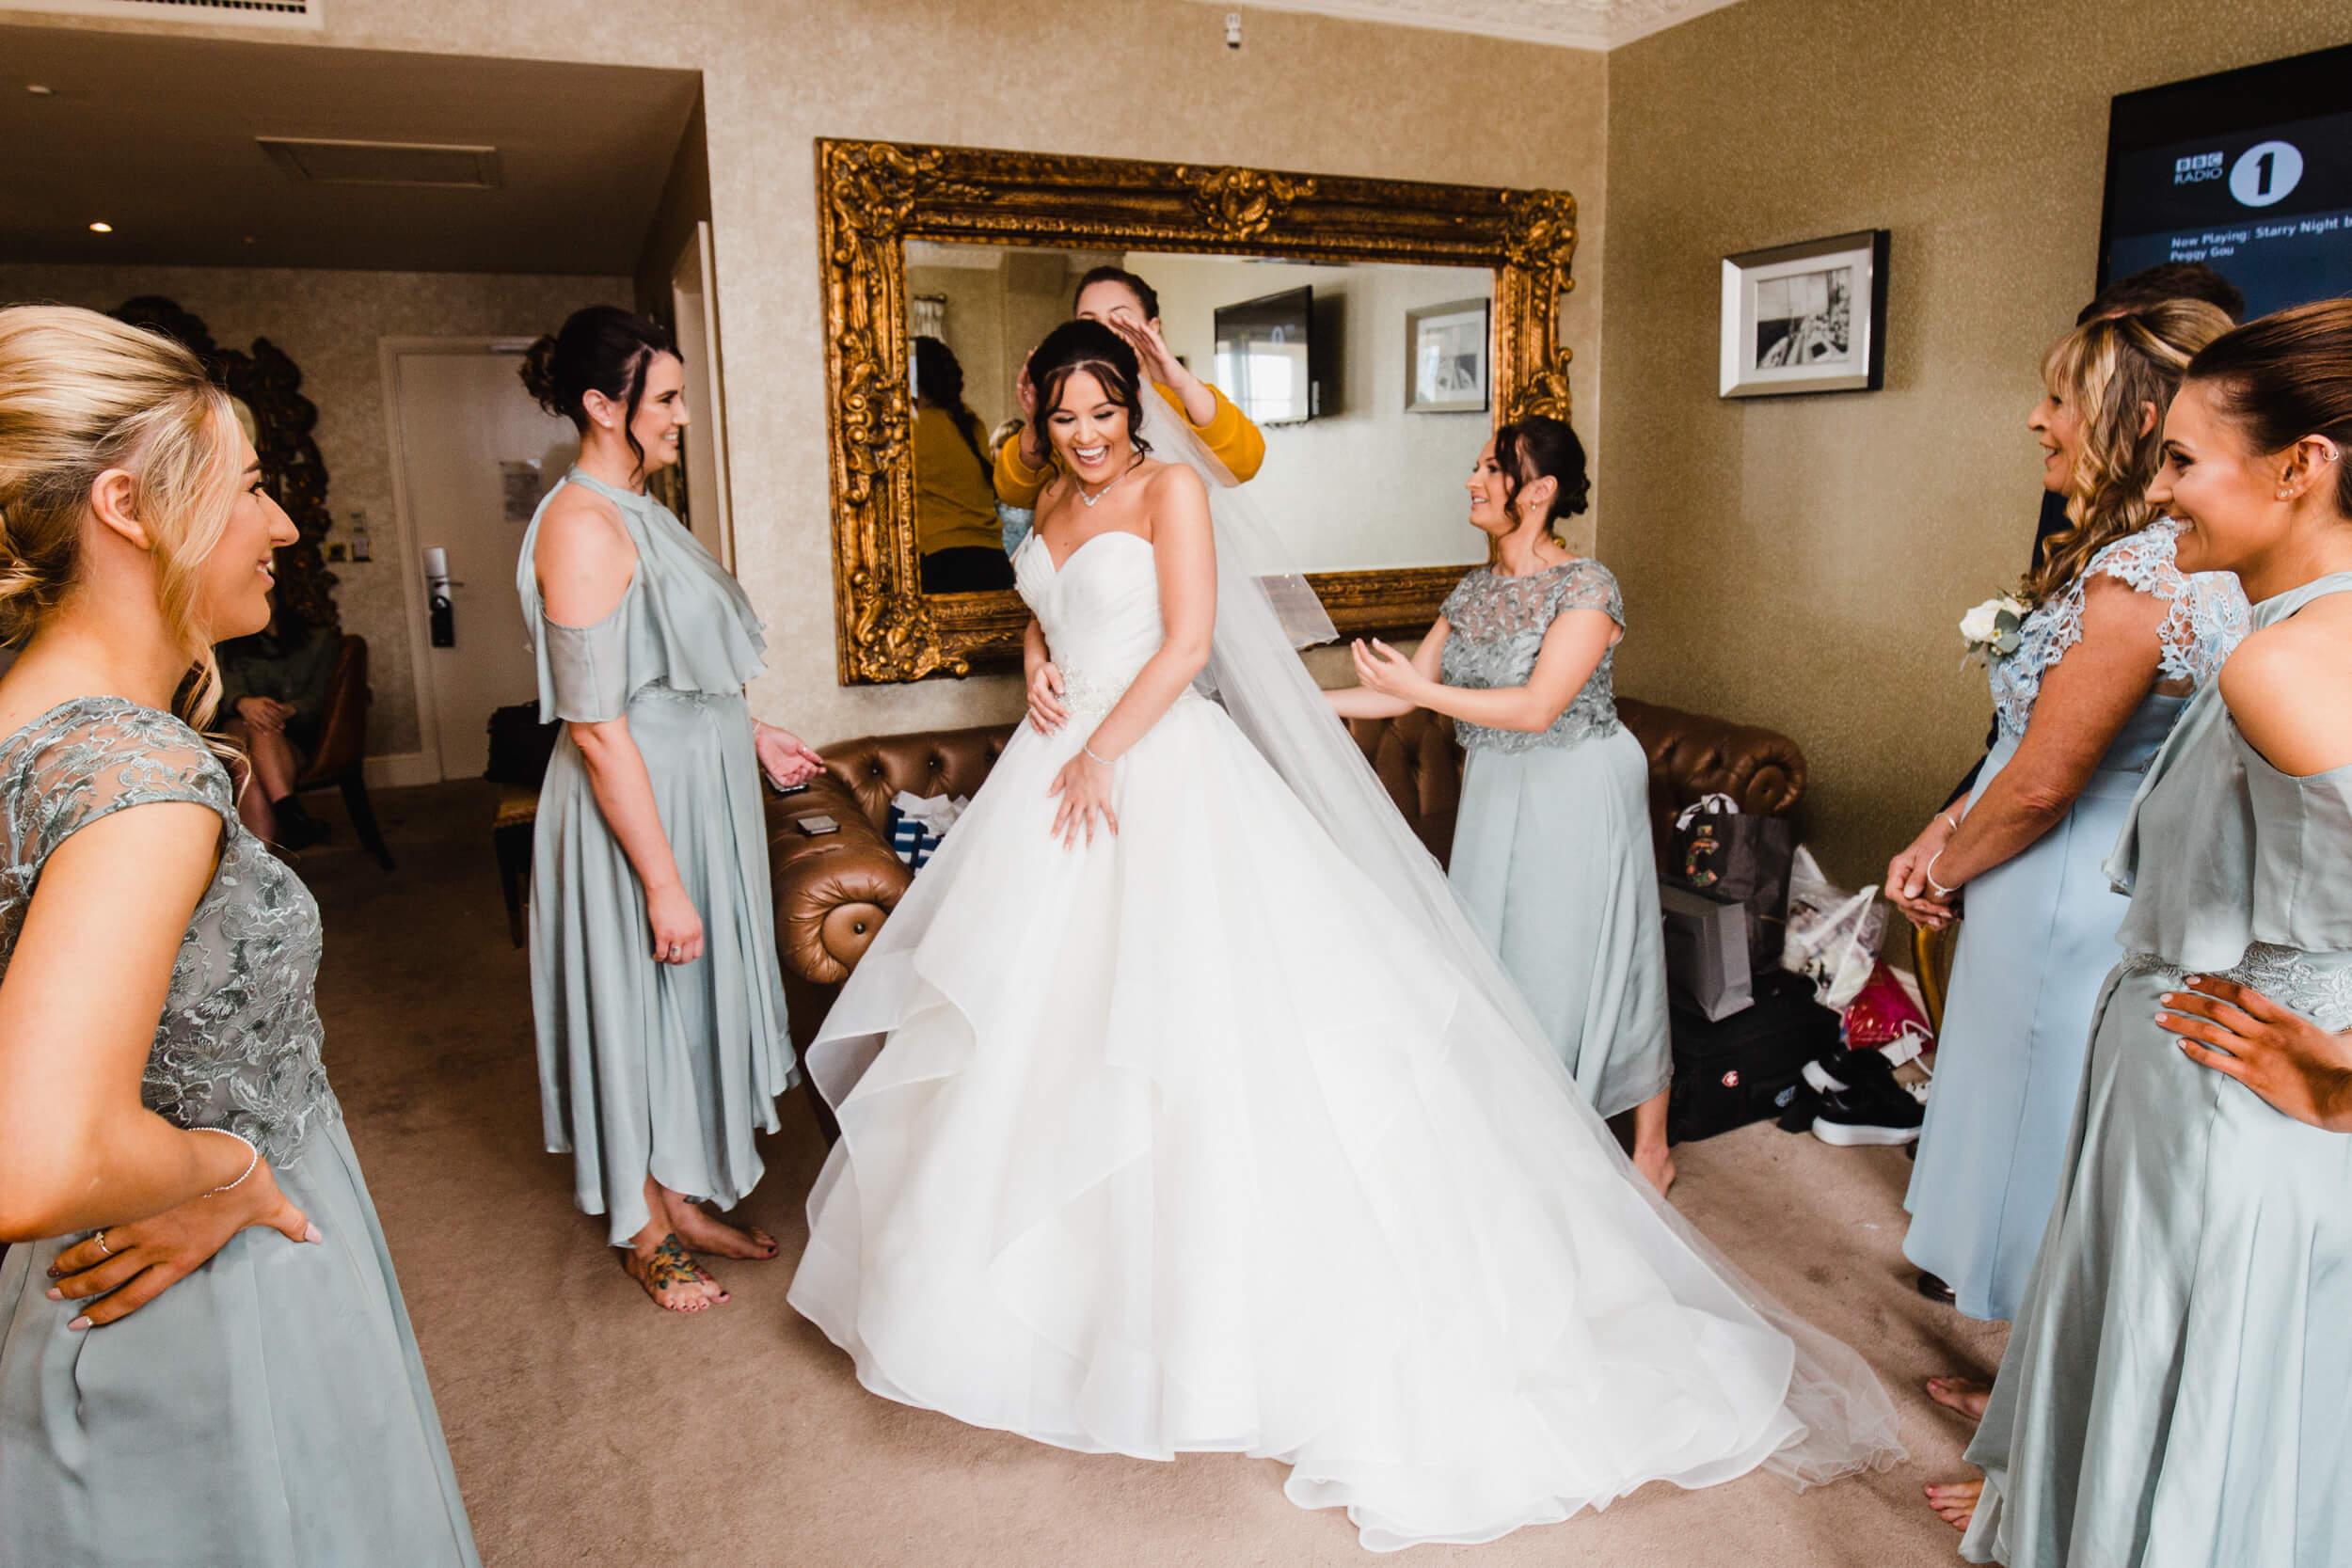 30_James_Street_Hotel_Wedding_Venue_013.jpg